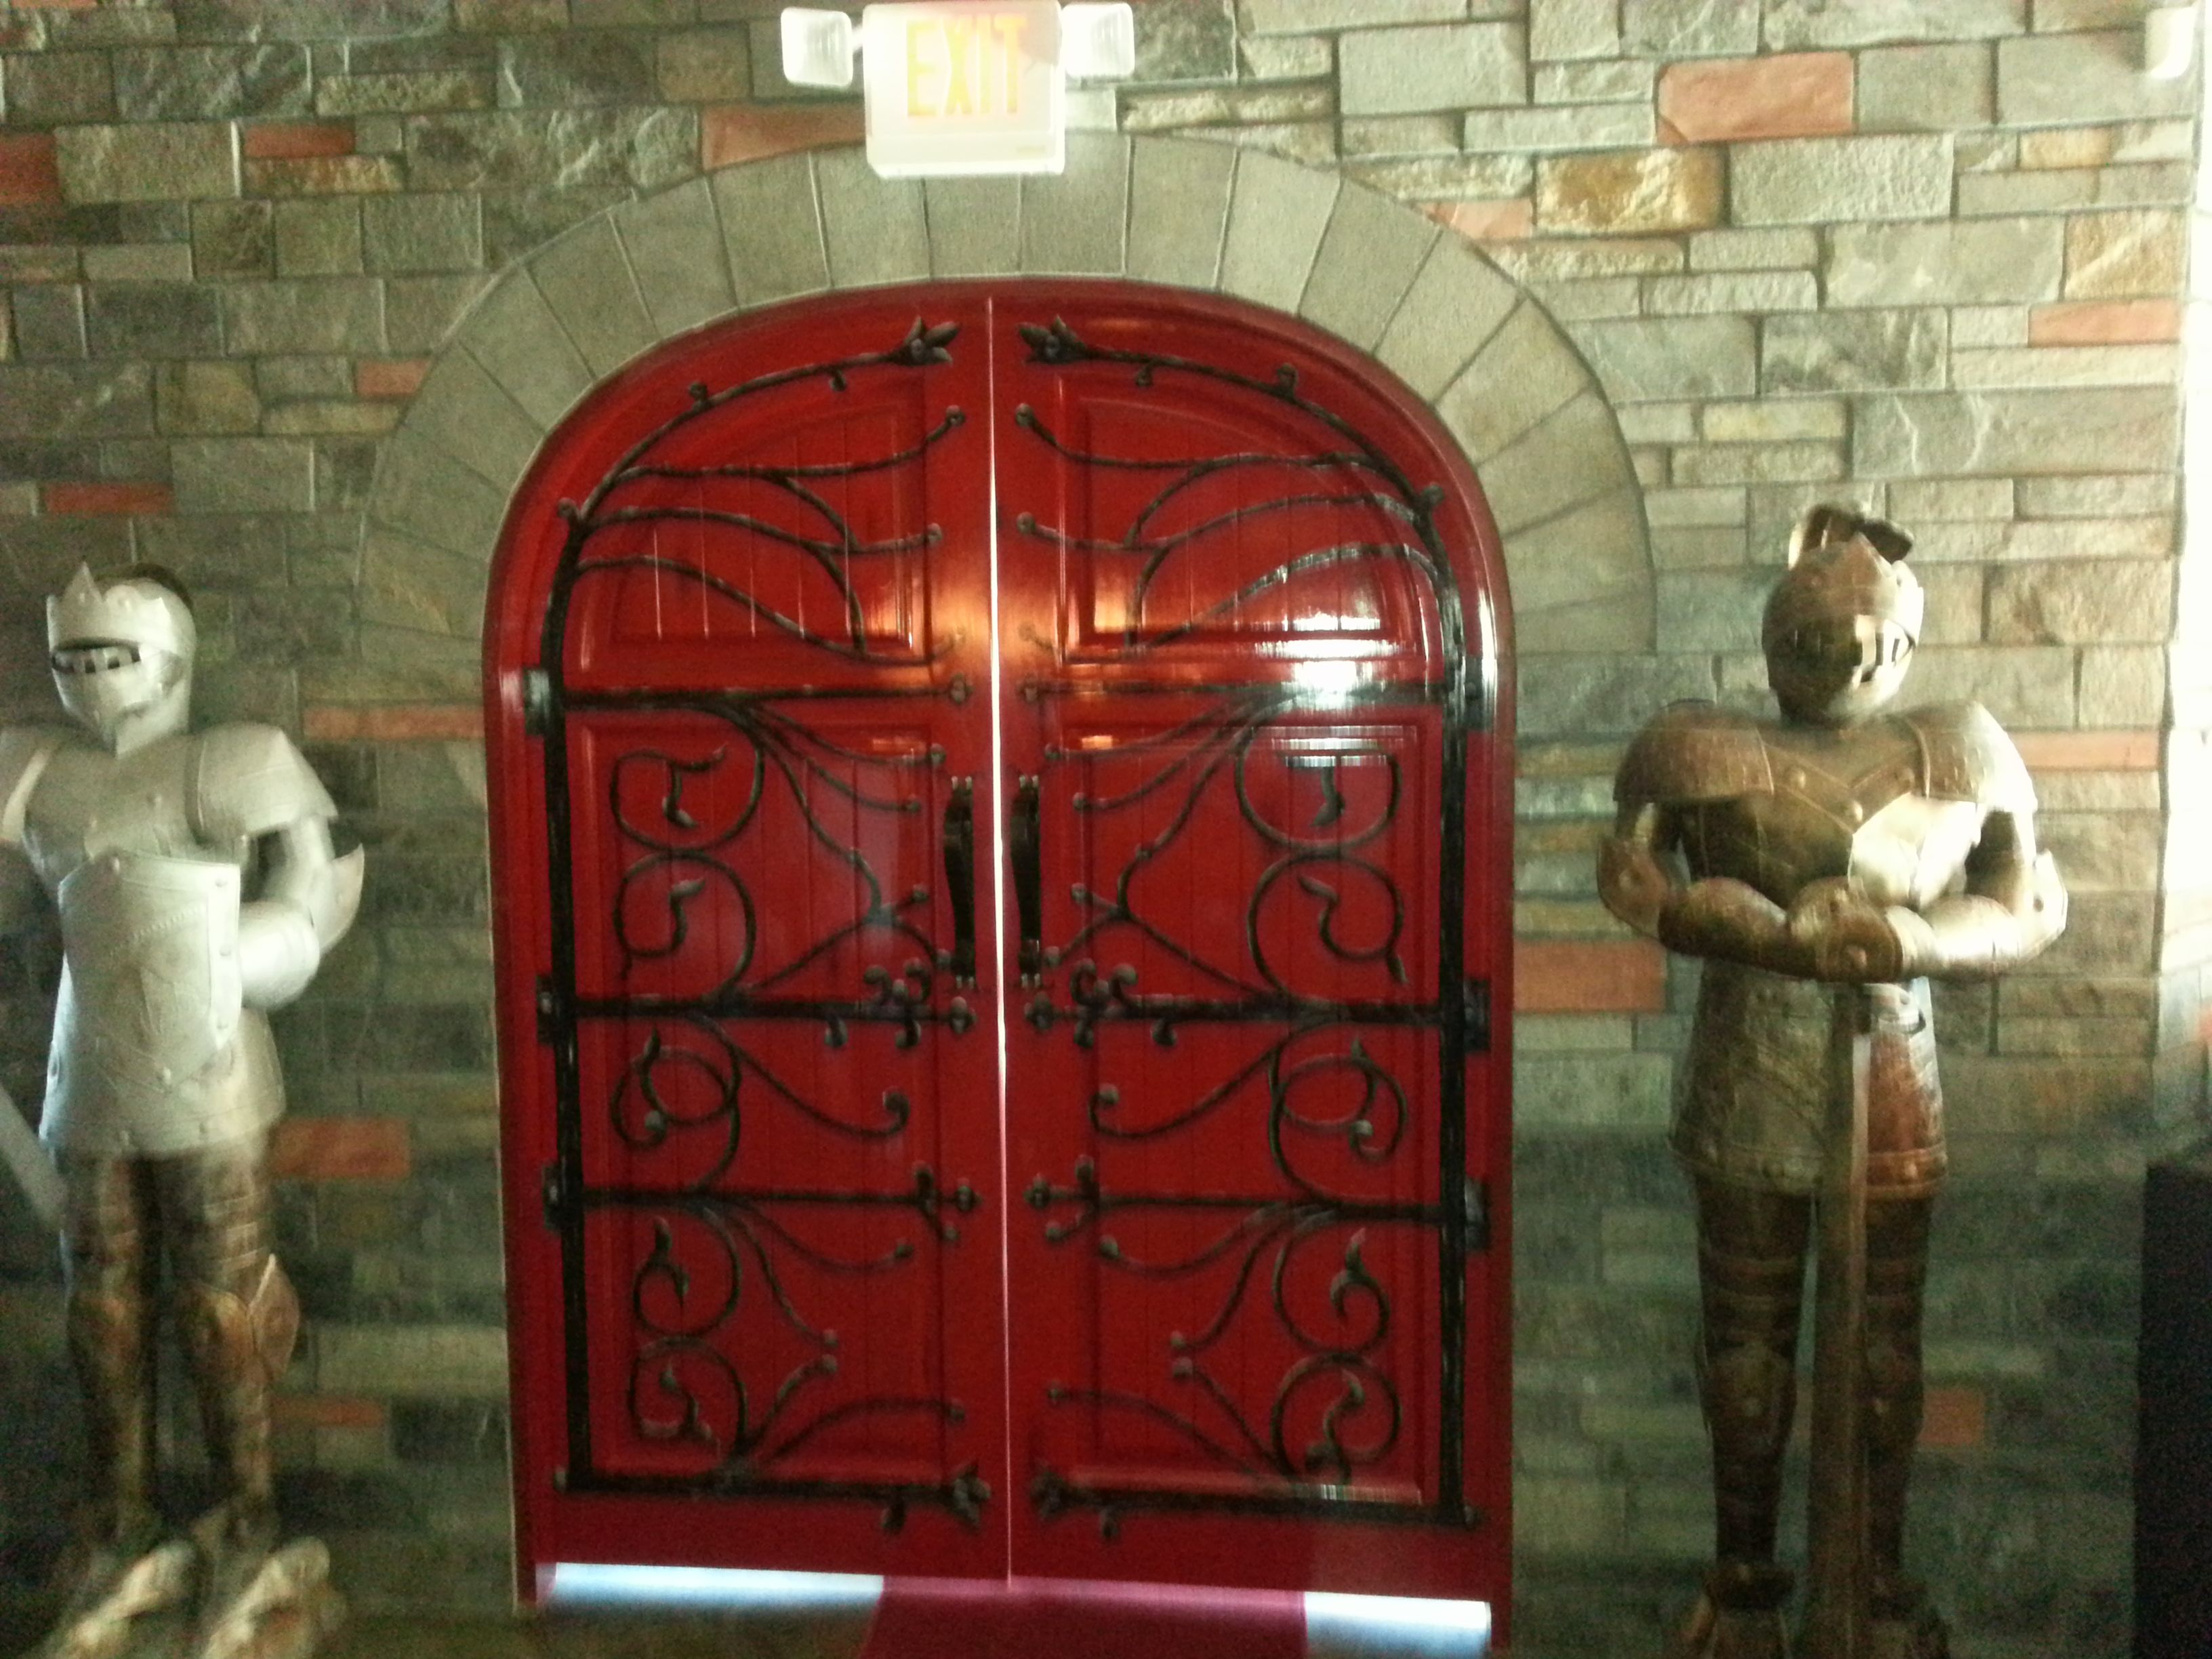 Front Door To Rooster Tavern In Scottsdale, AZ